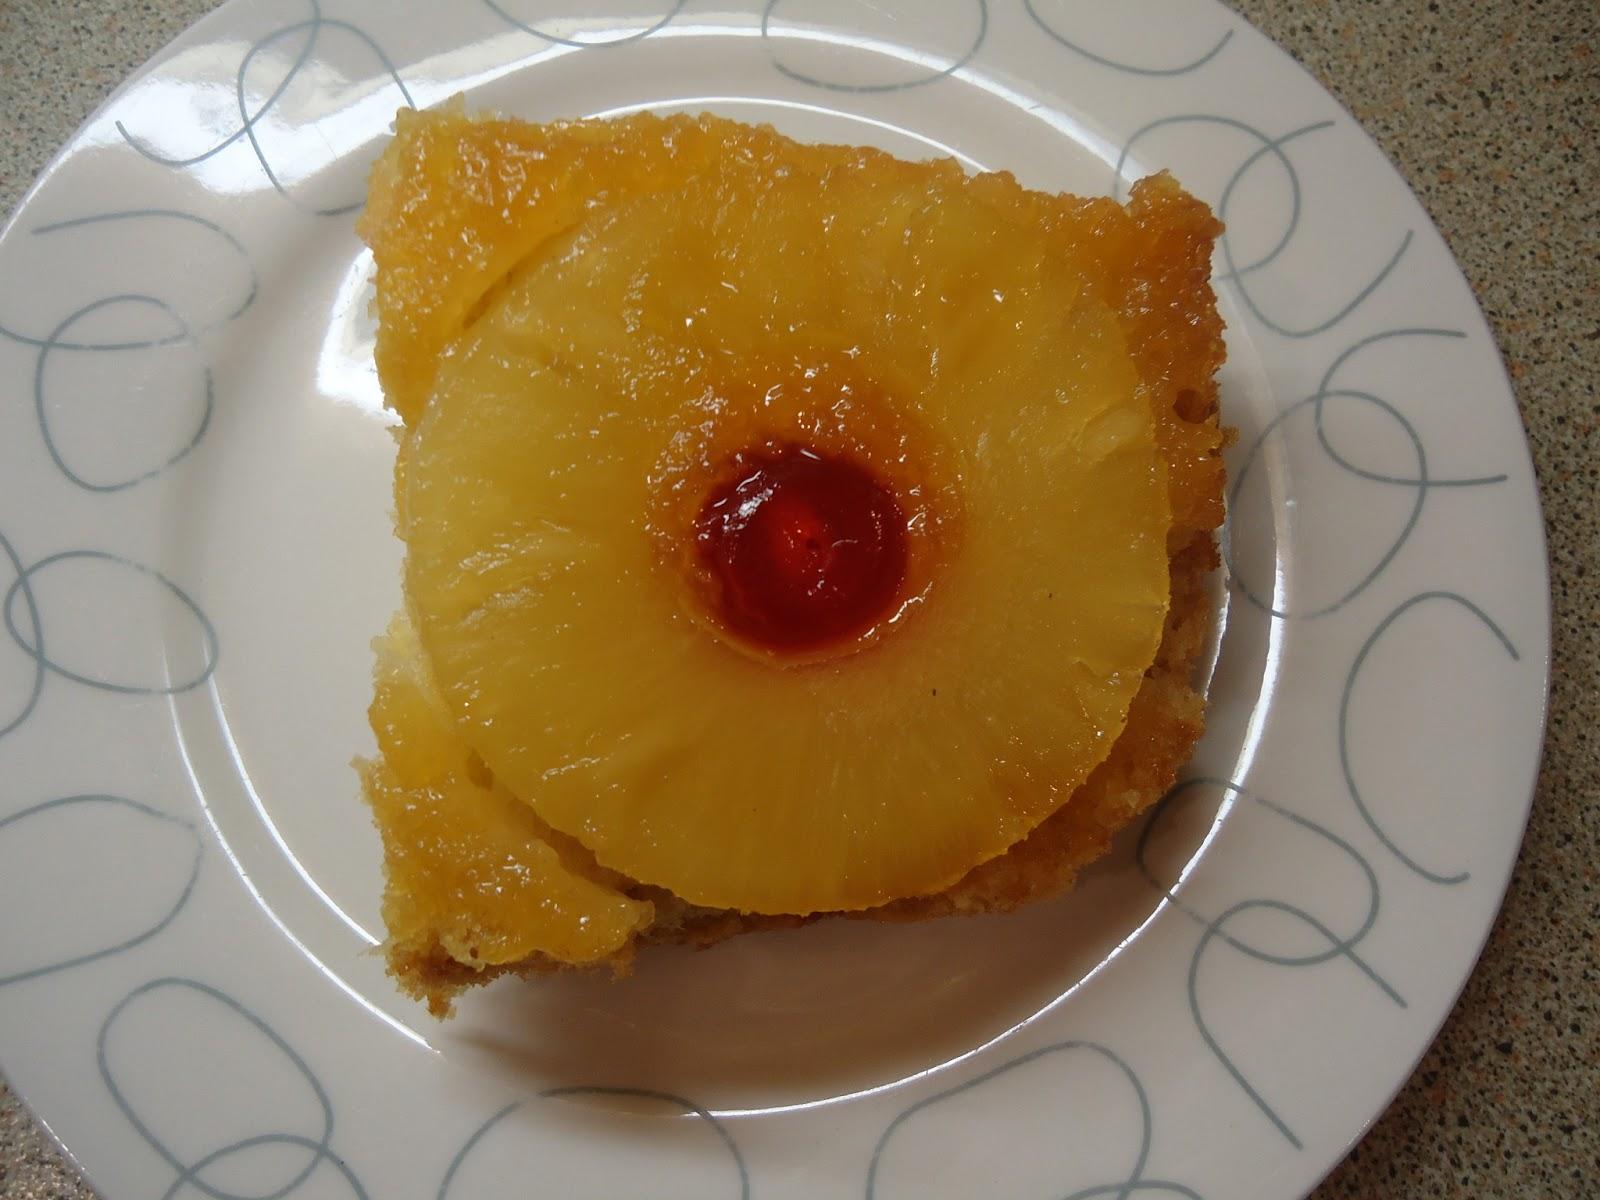 Upside Down Pineapple Sponge